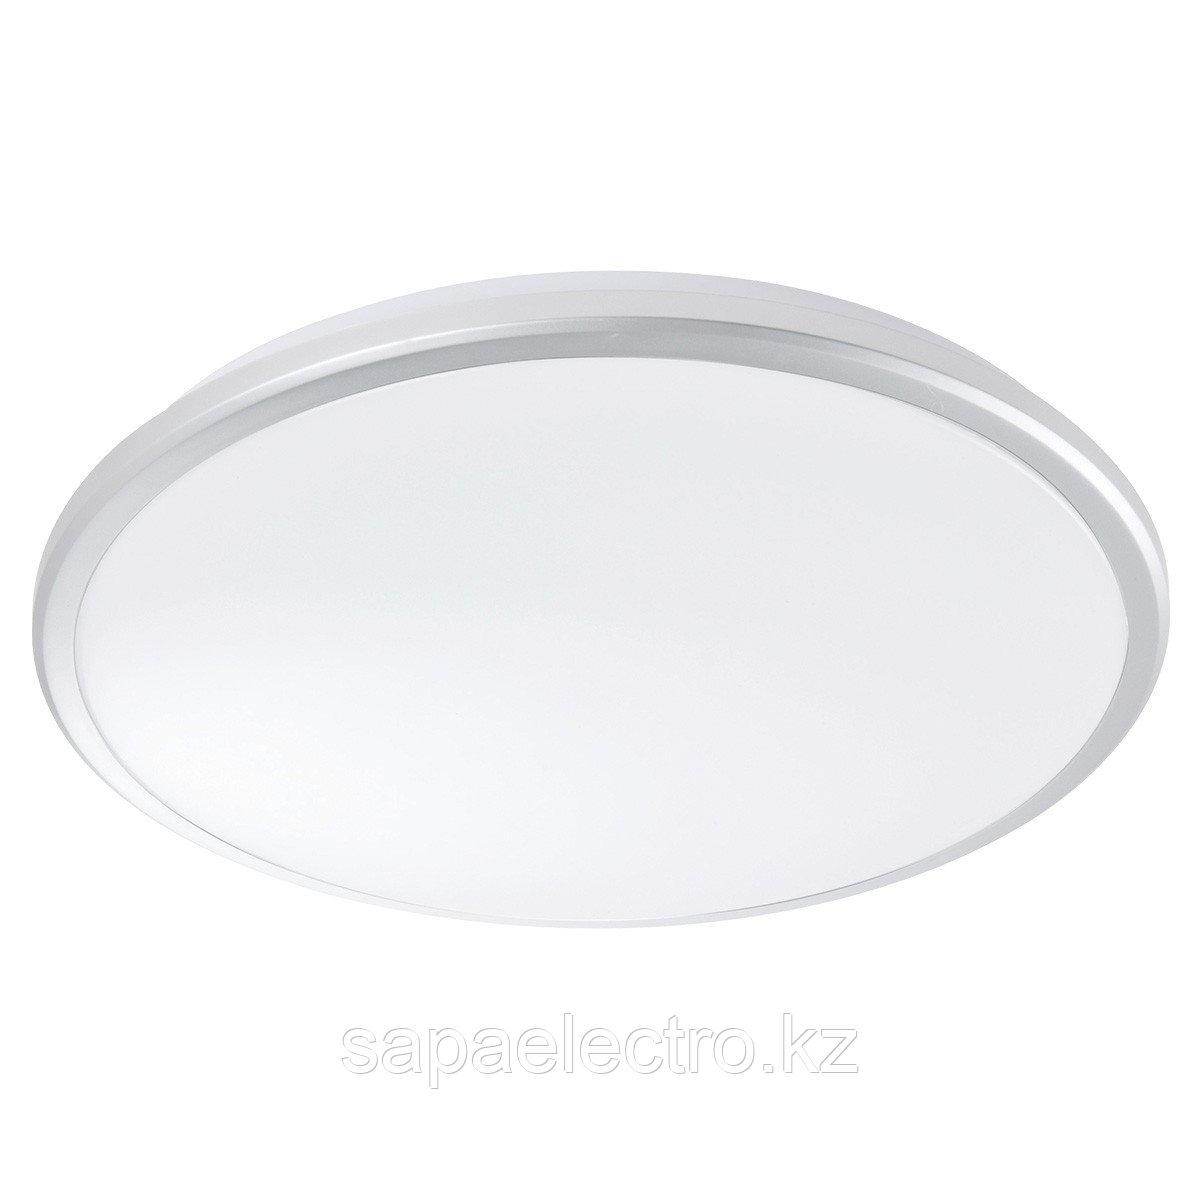 Свет-к RONDO LED 30W 5500K   (TEKSAN) 8шт